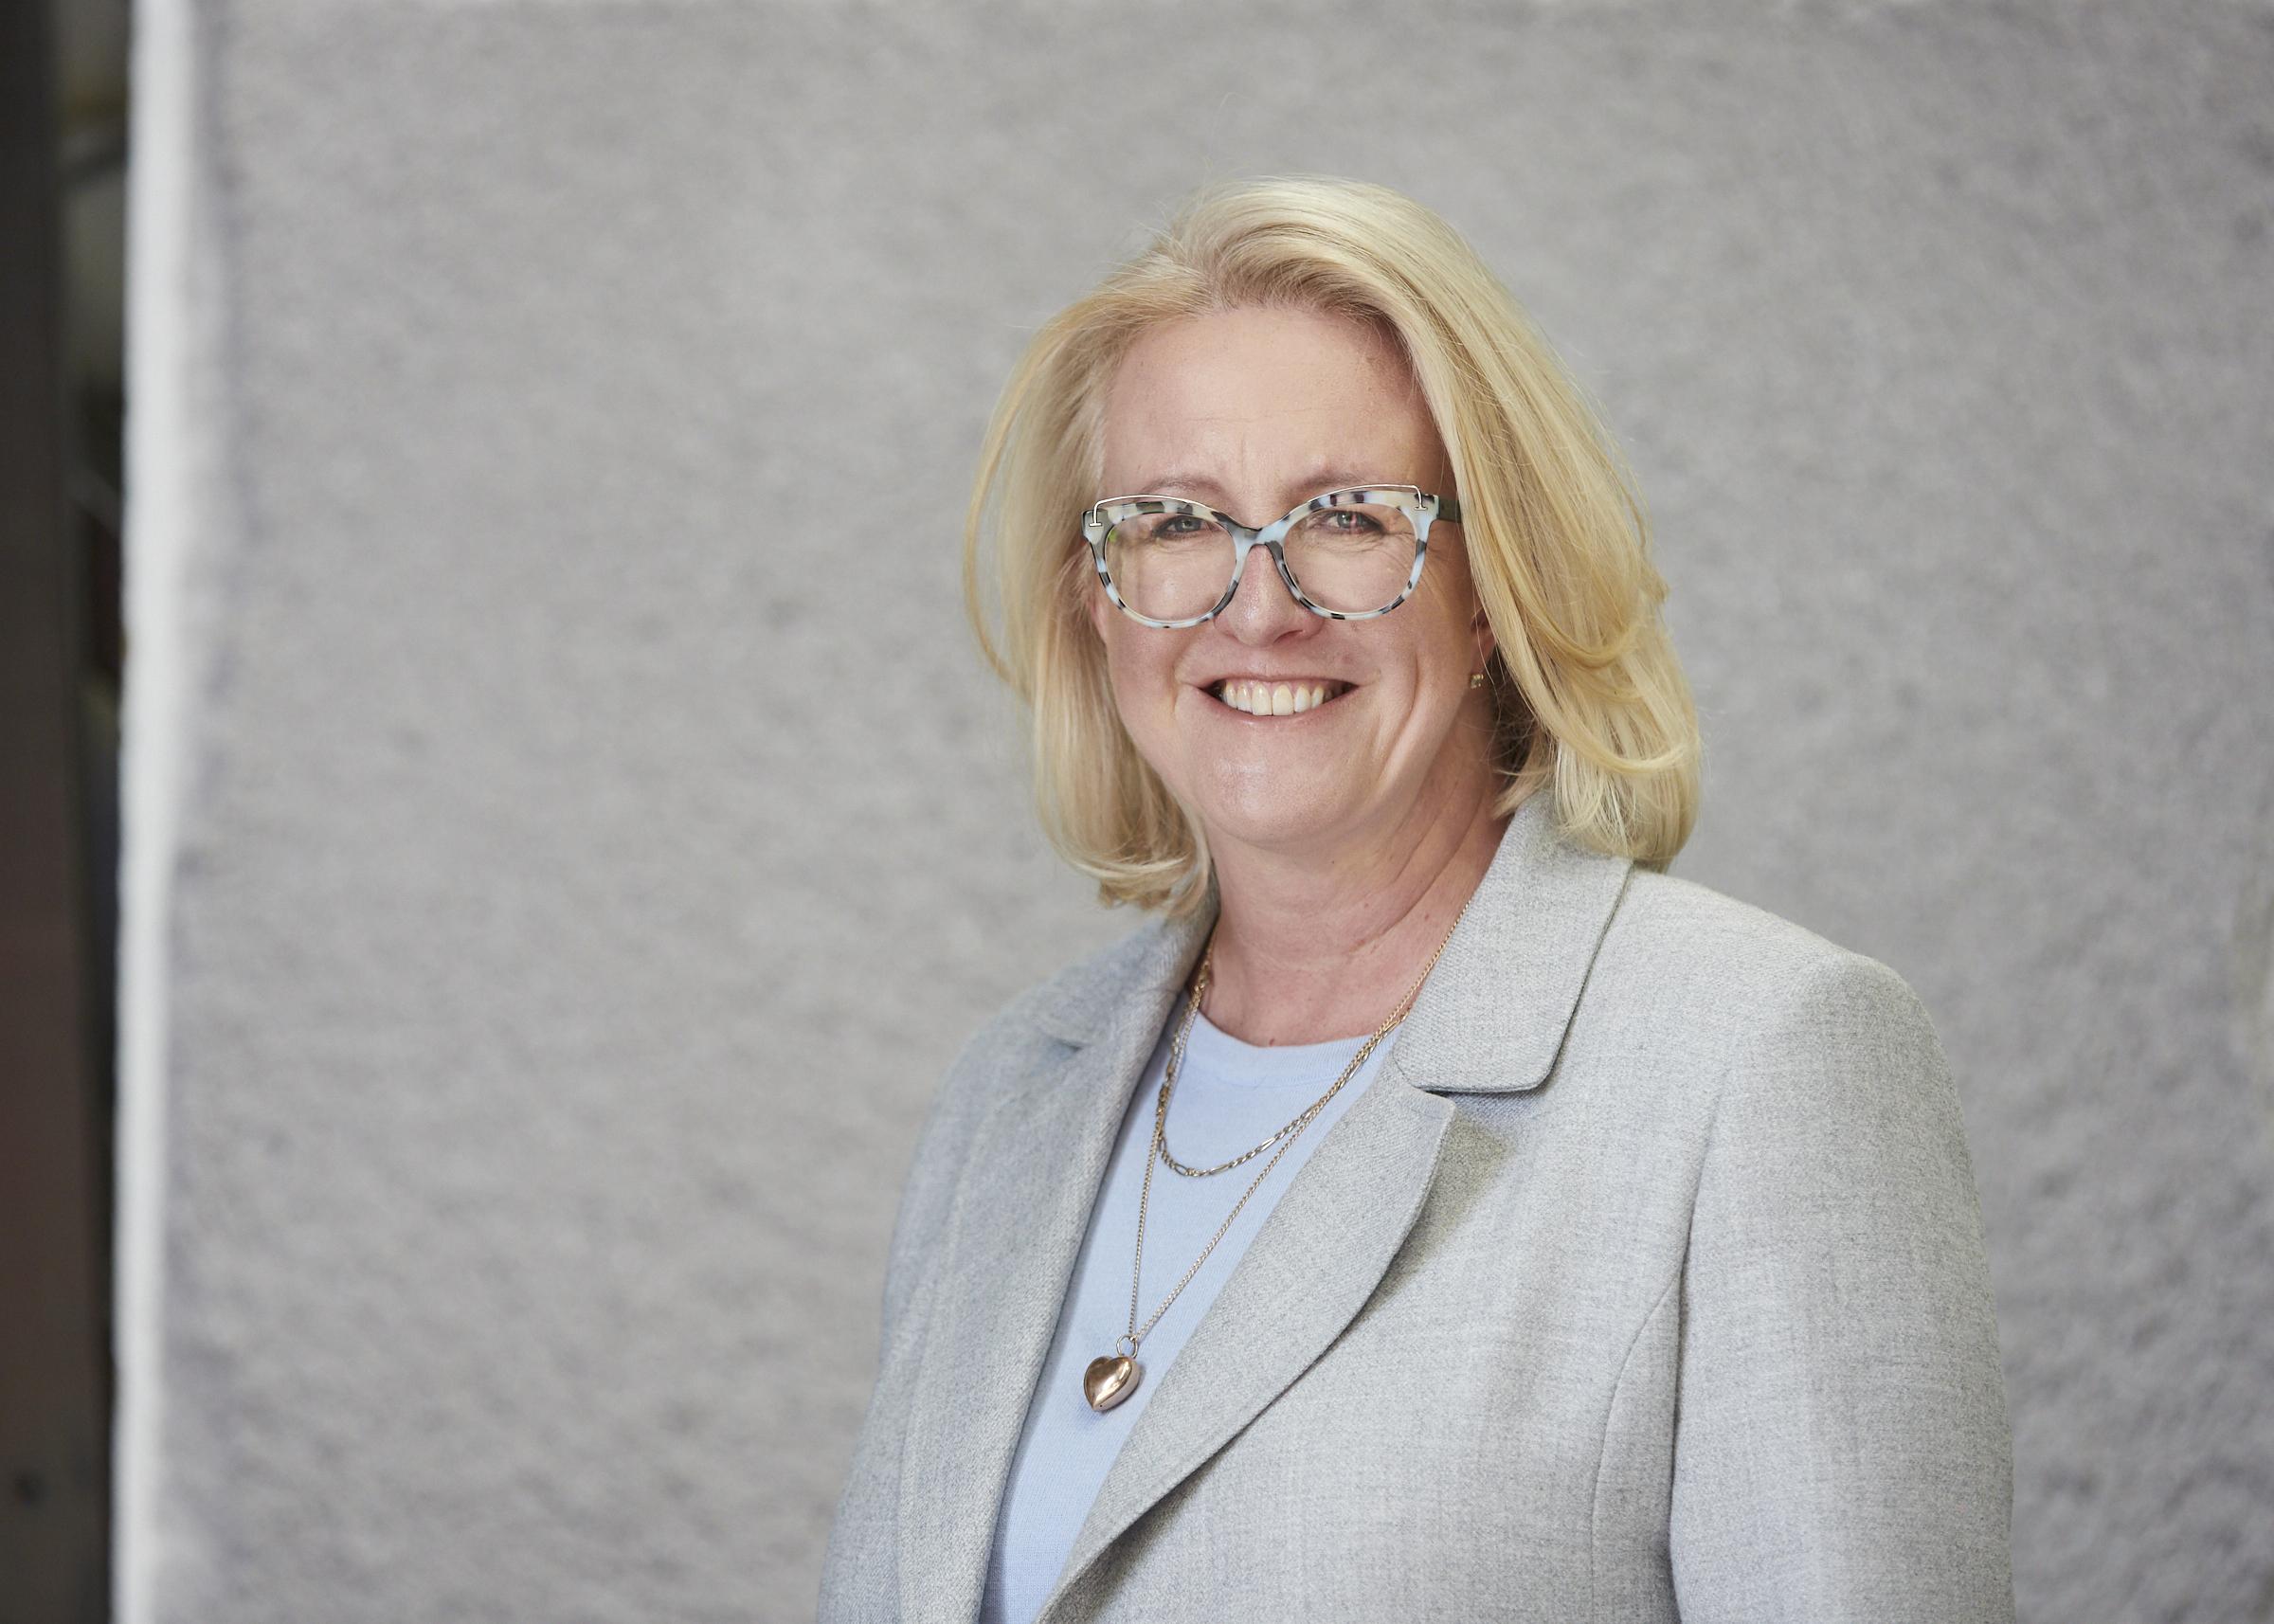 Felicia Richardson female CEO Australia